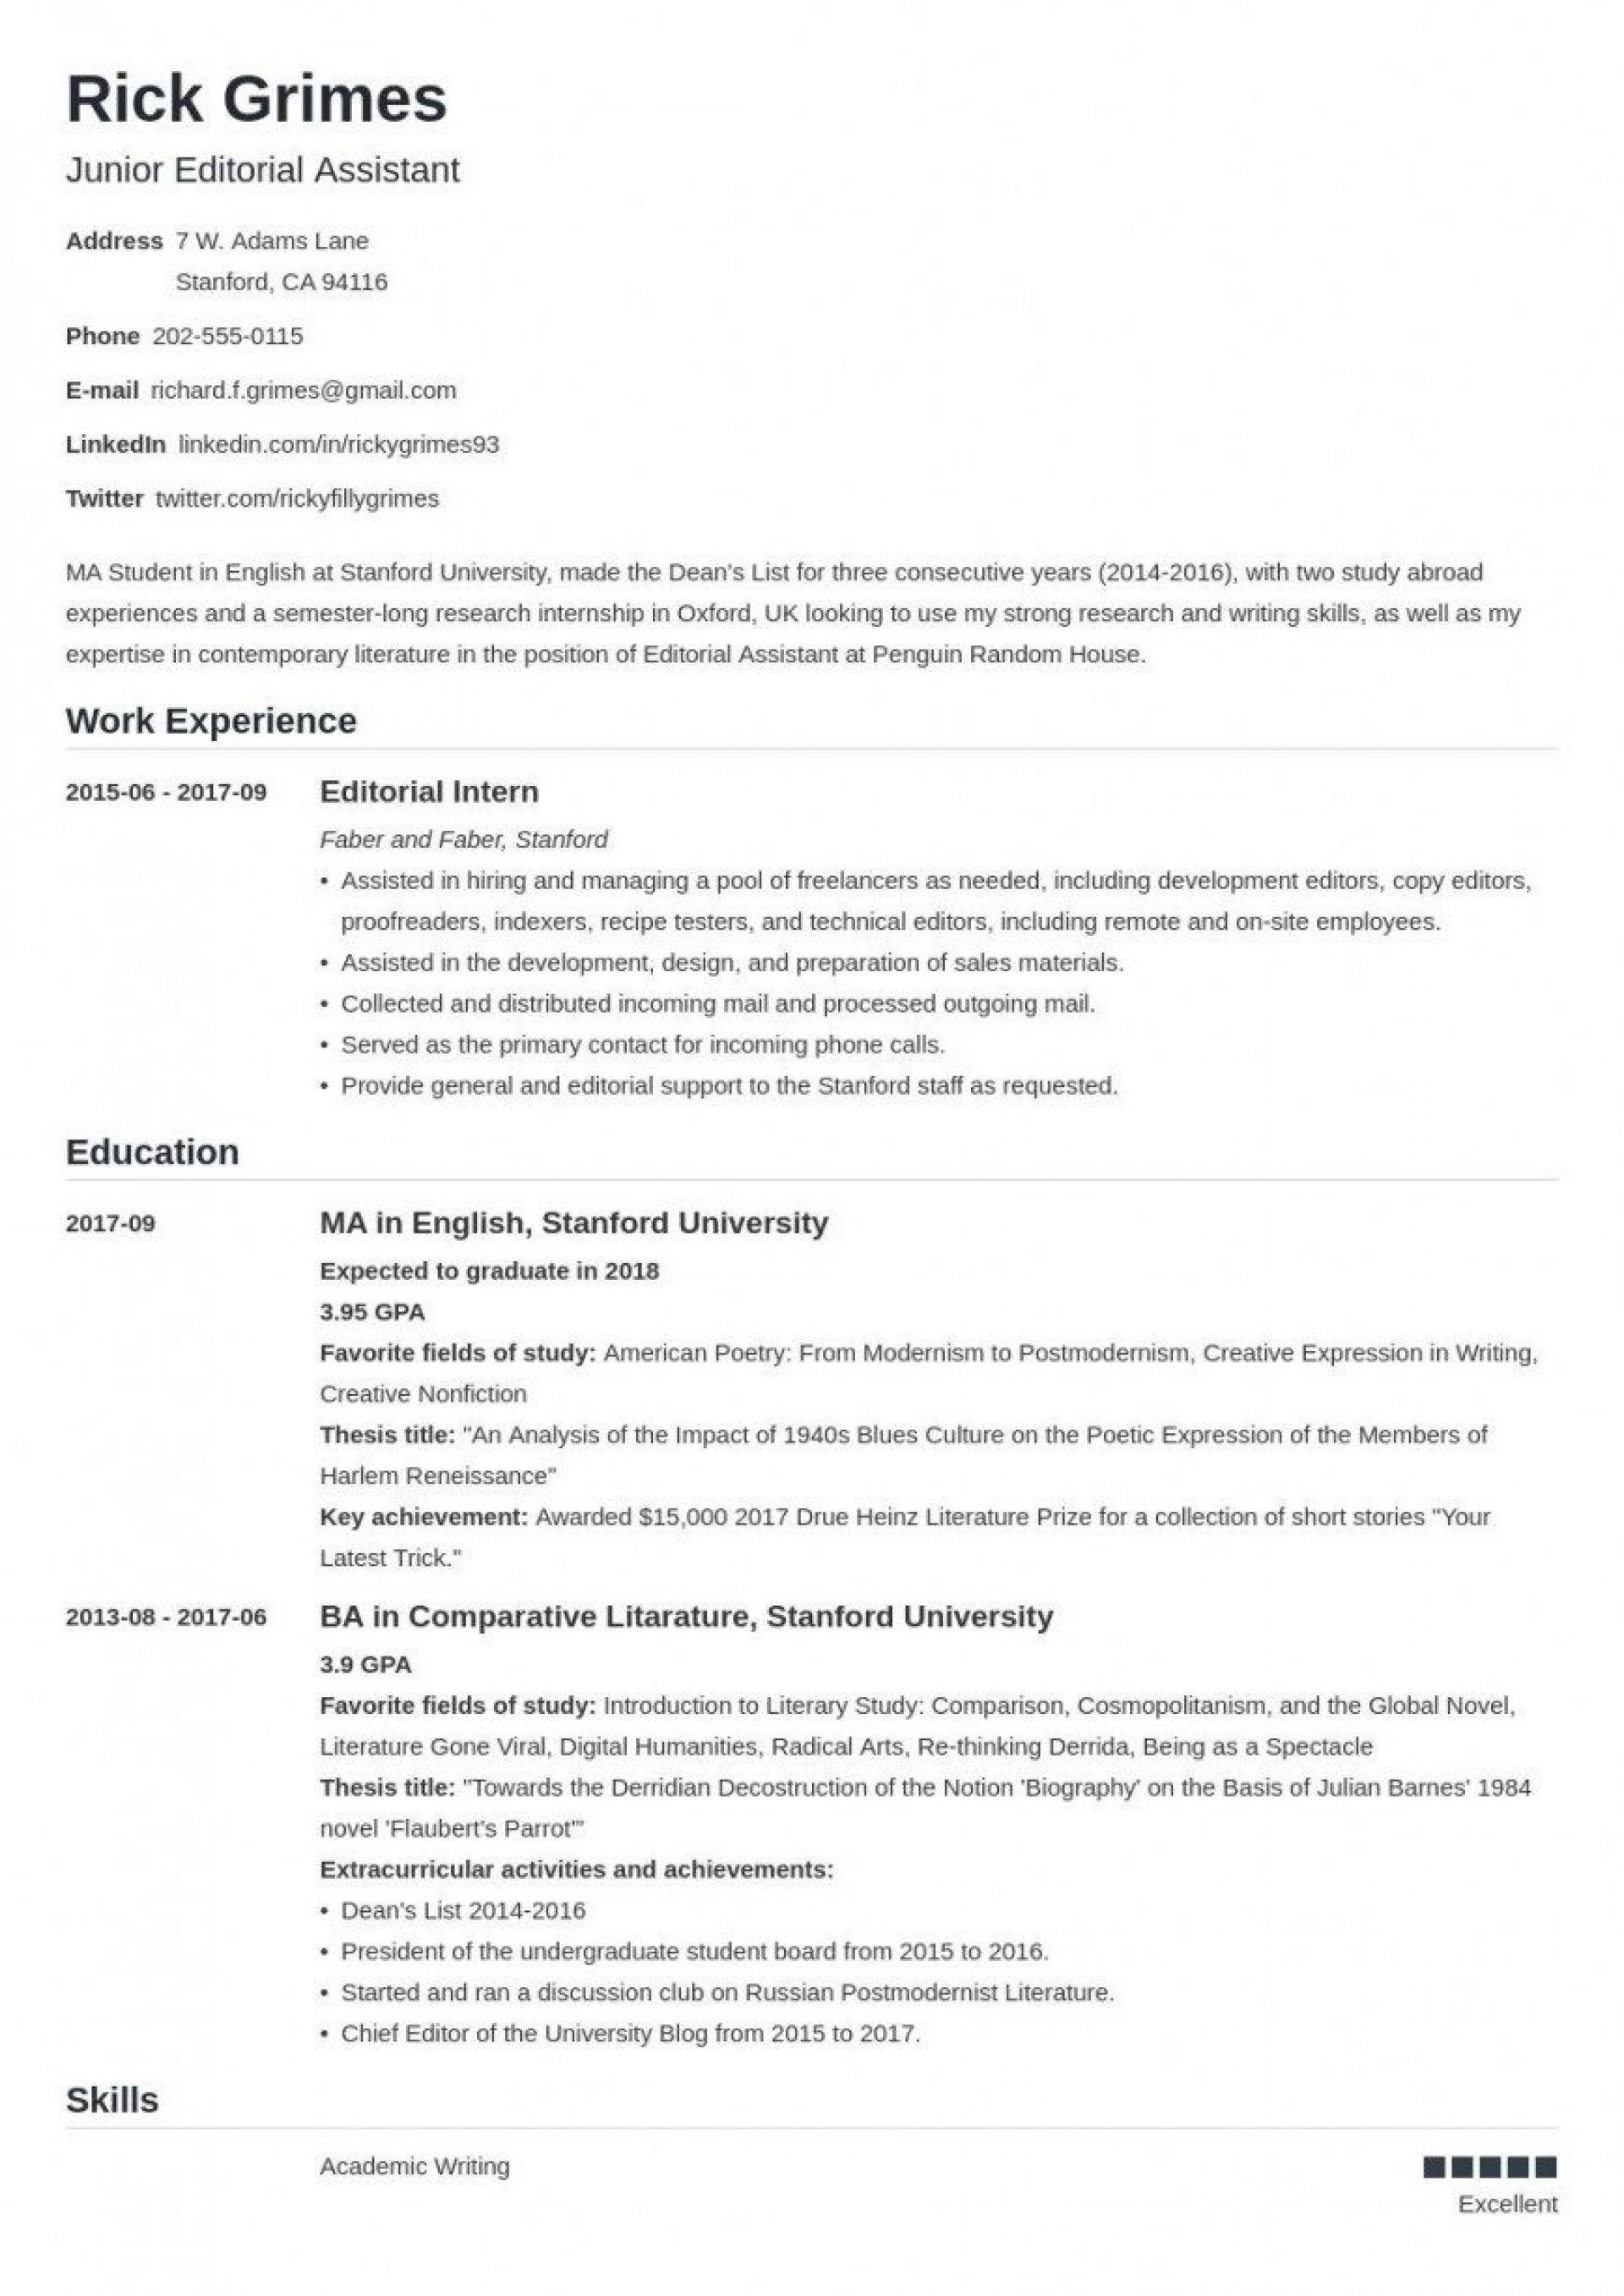 006 Wondrou Graduate School Curriculum Vitae Template Highest Quality  For Application Resume Format1920